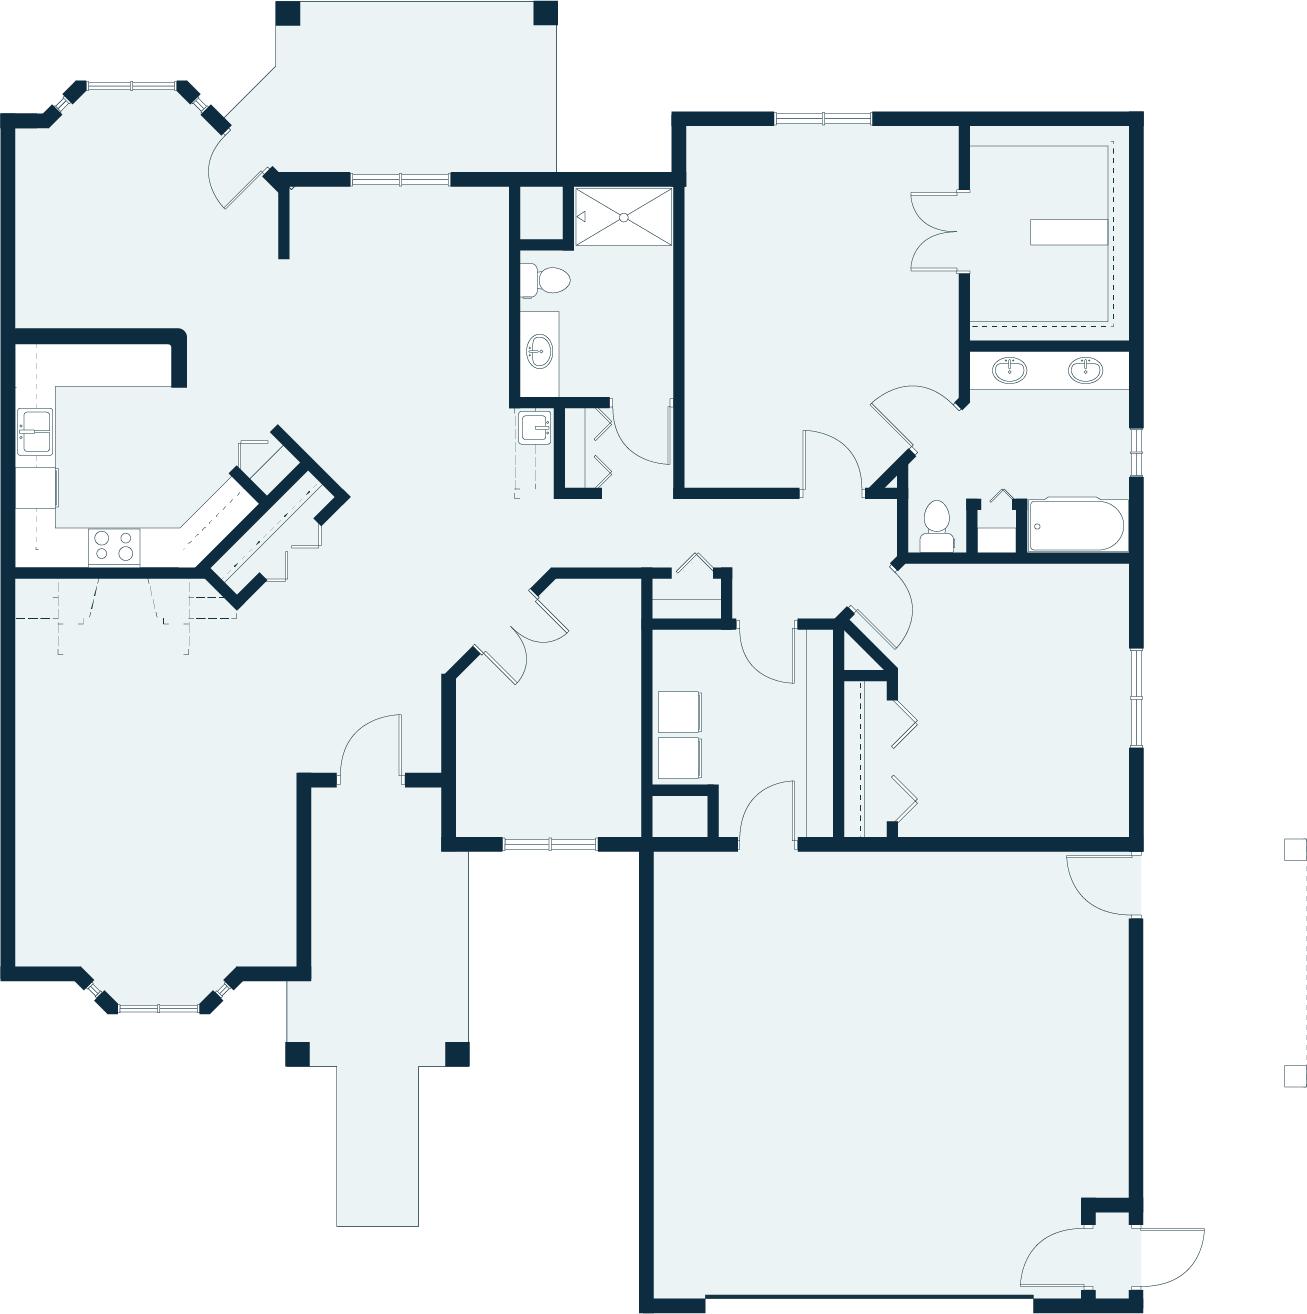 Nightshade floor plan